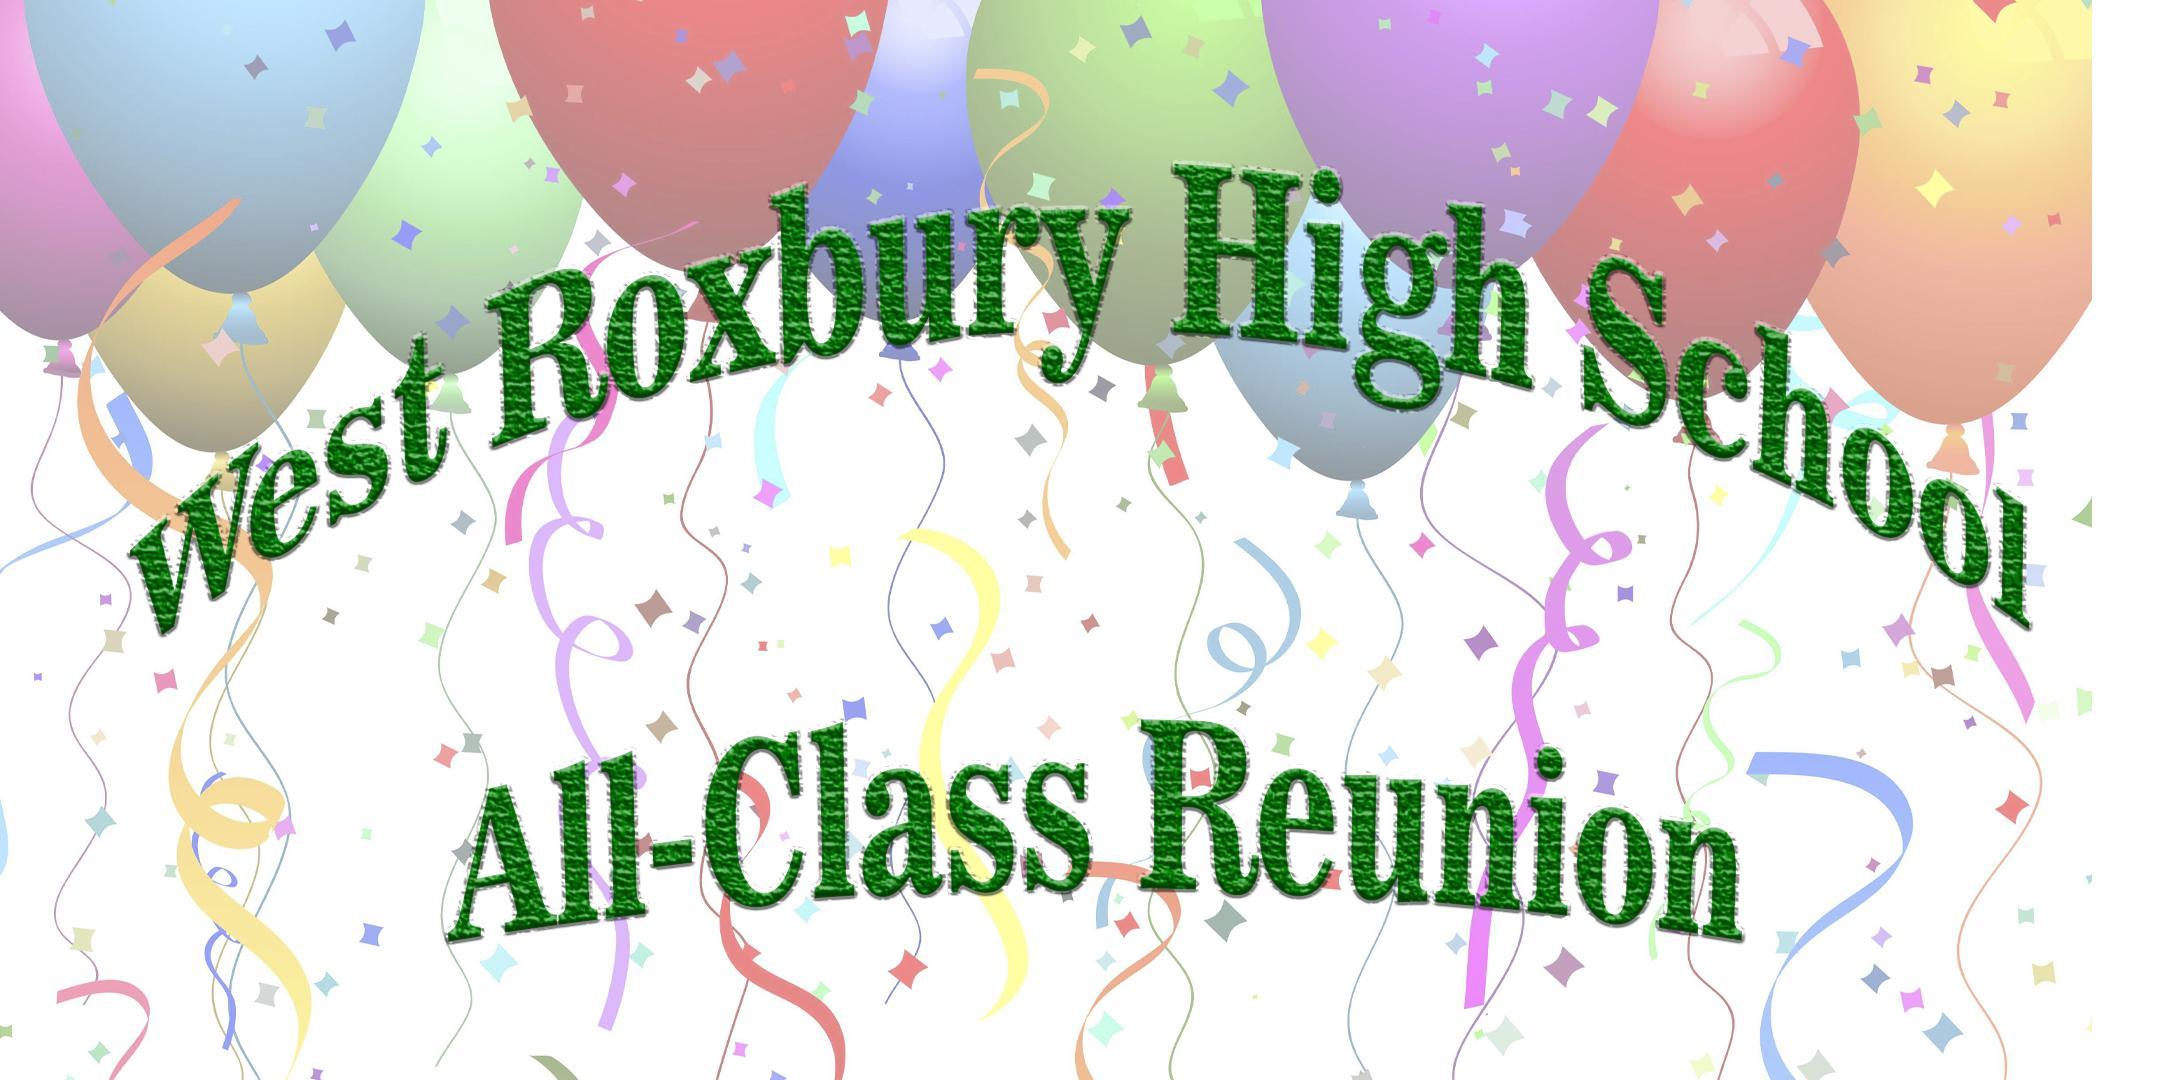 West Roxbury High School All-Class Reunion